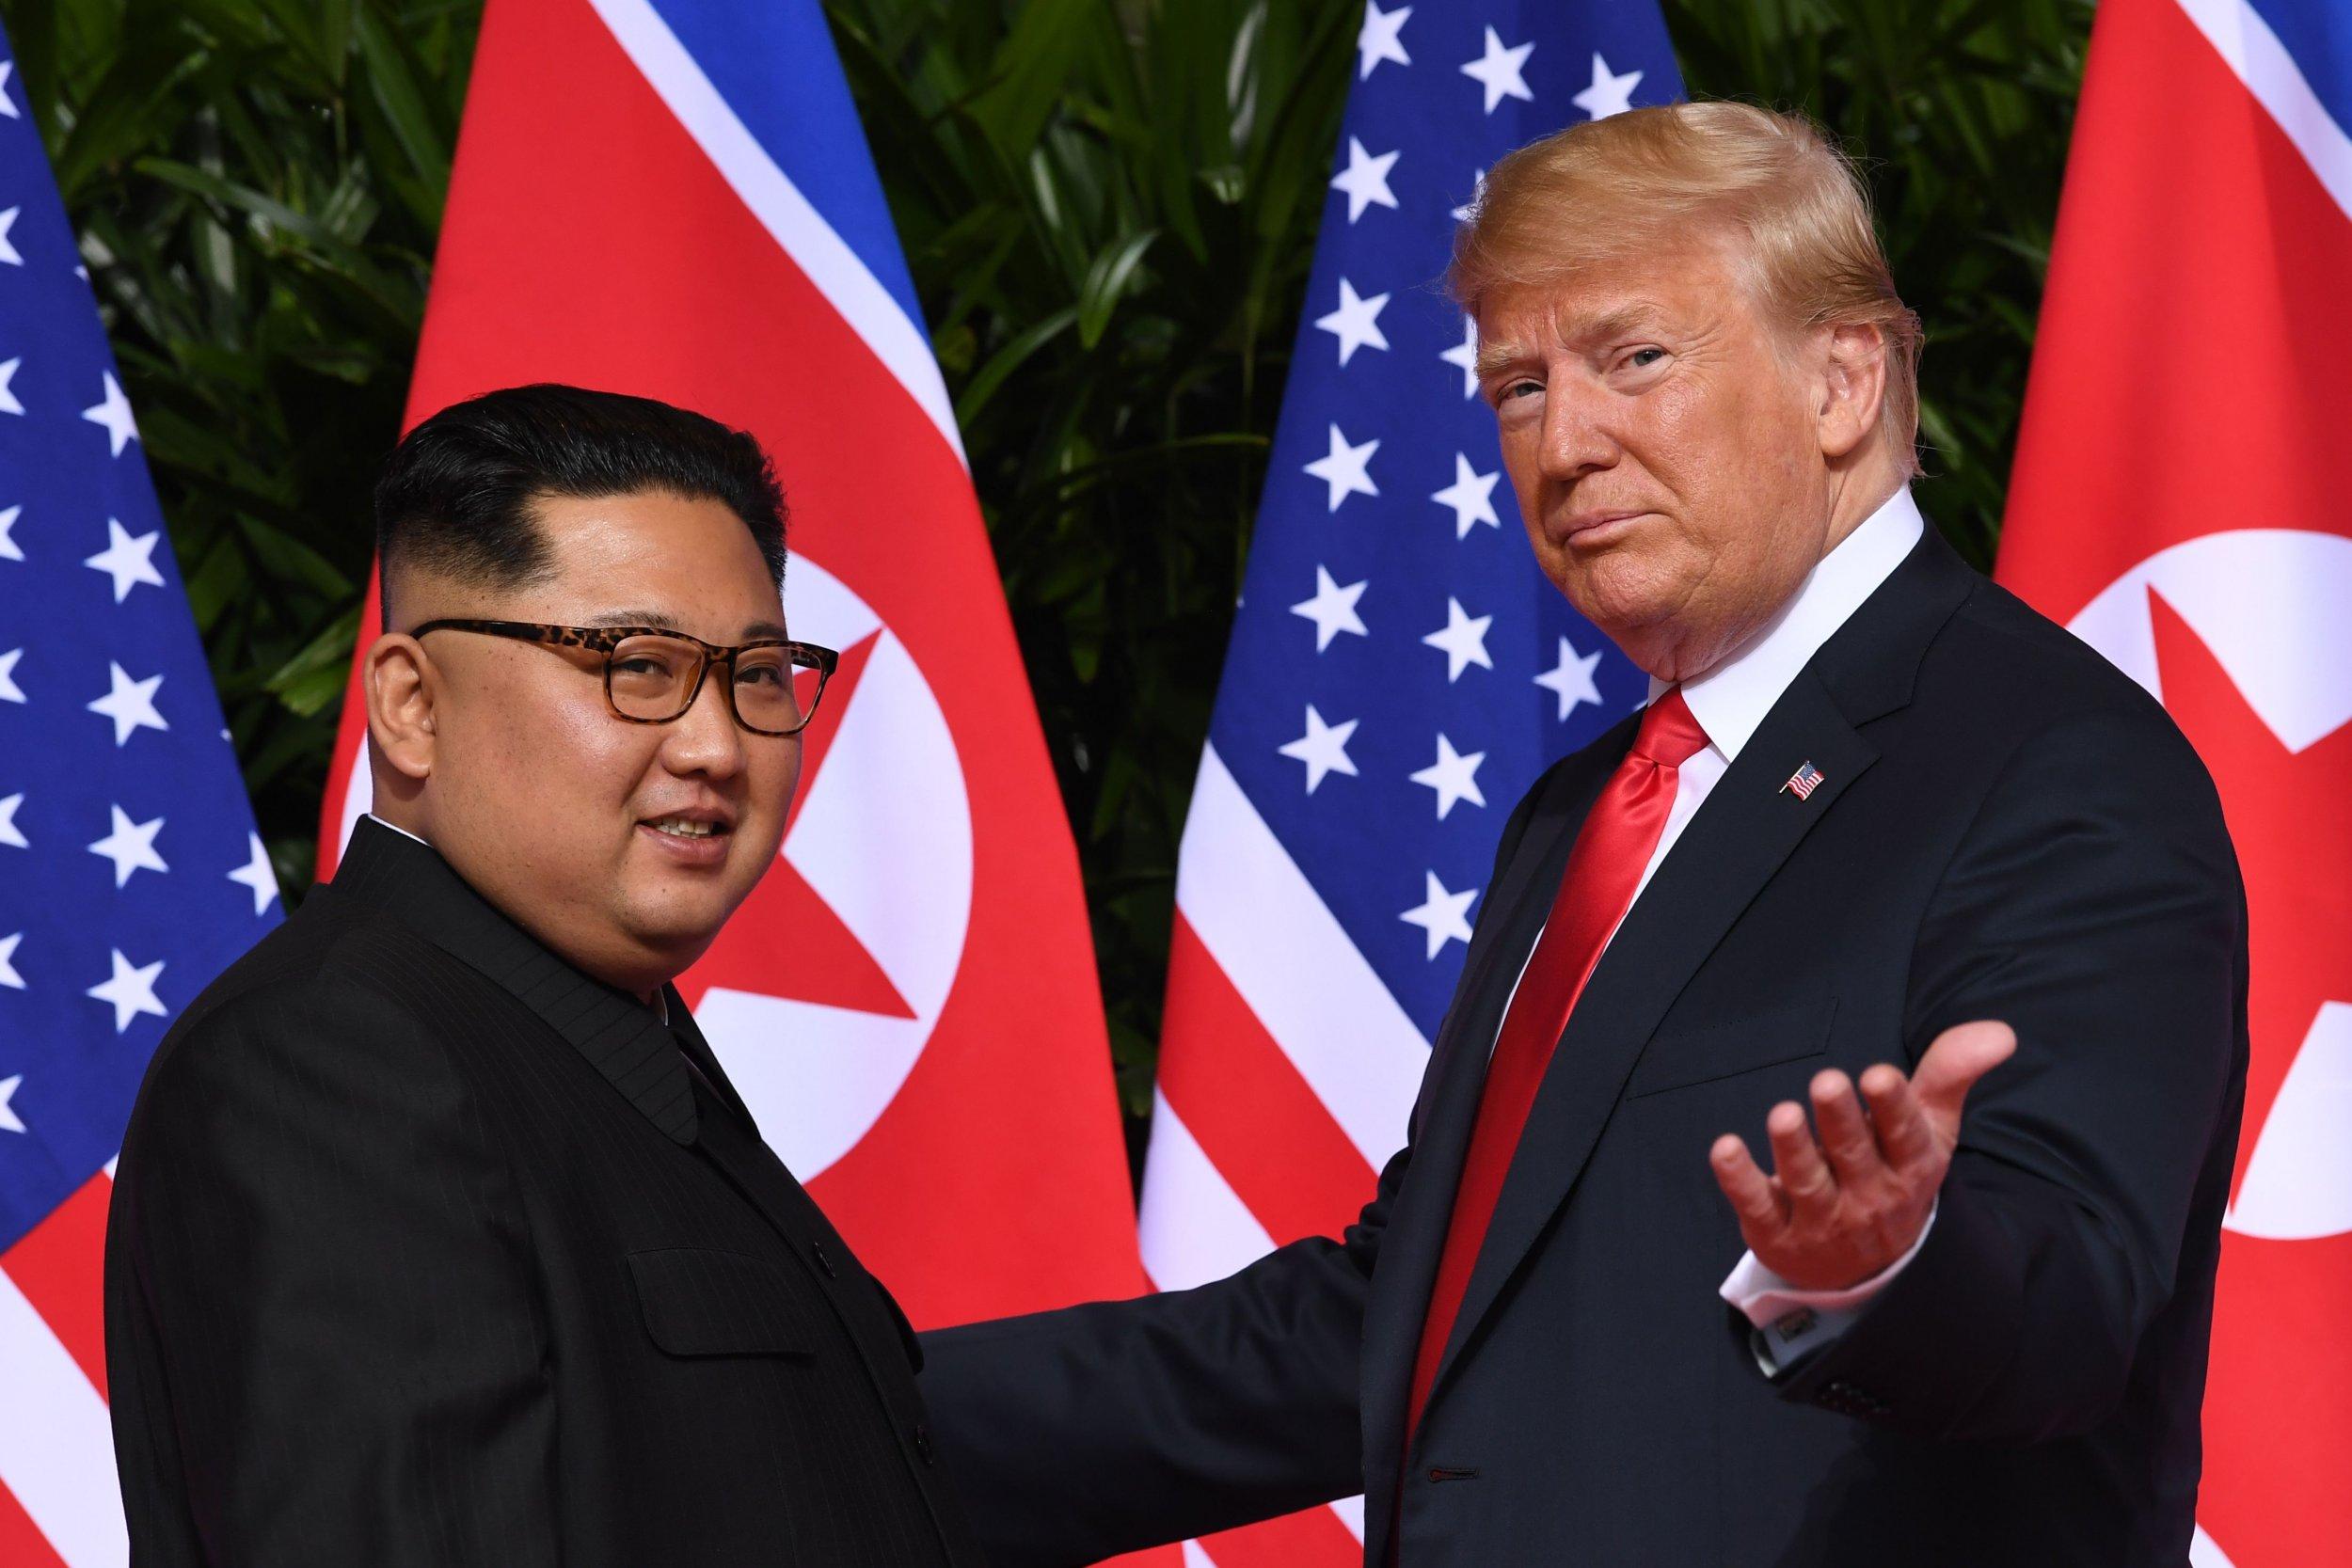 donald trump and north korea peace, missiles